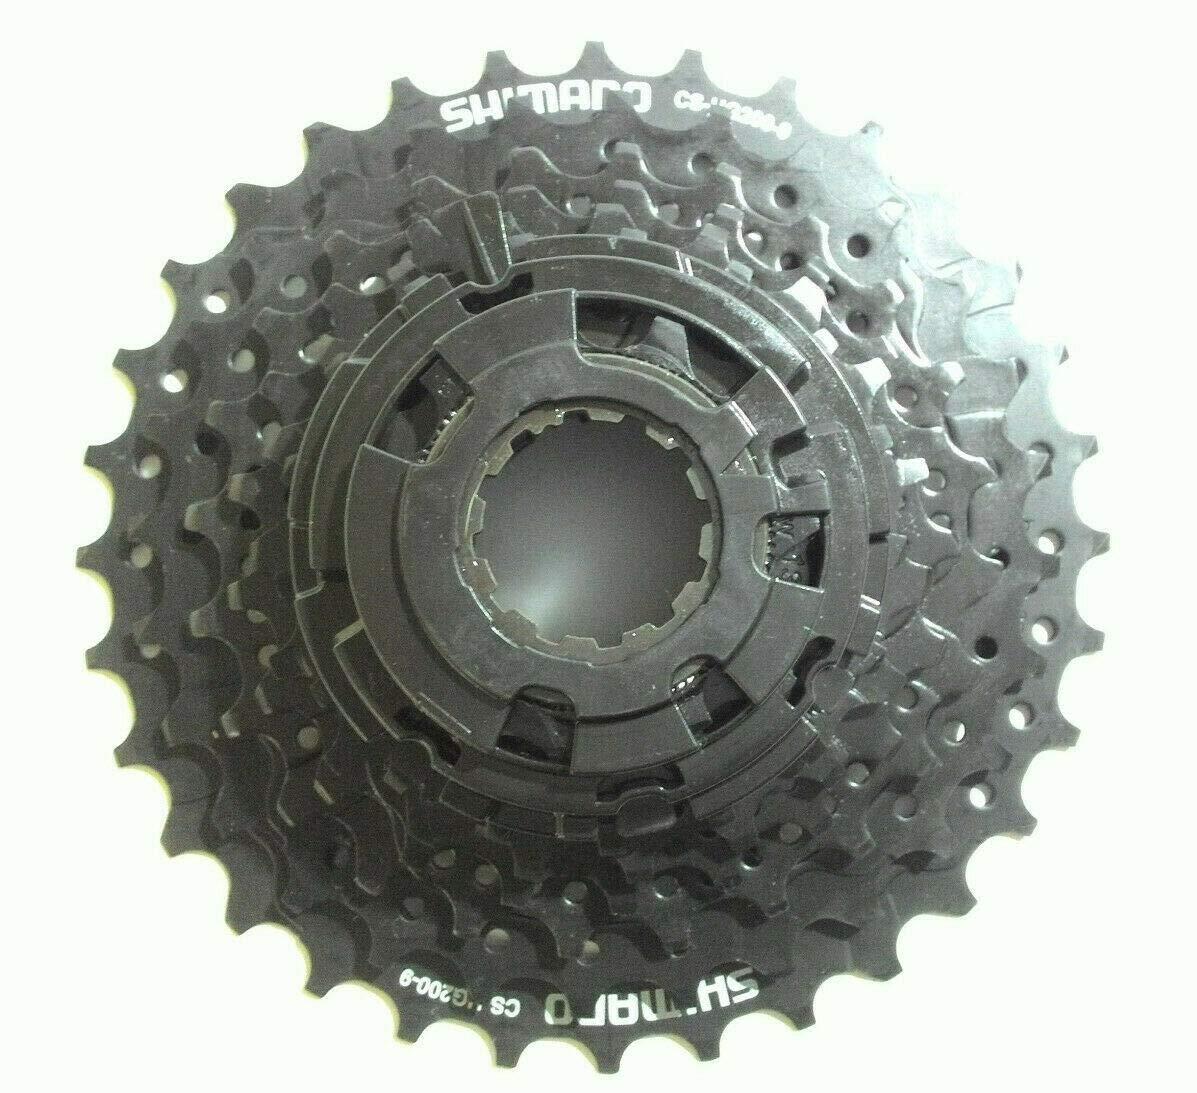 JKSPORTS ShimanoAlivio CS-HG200 9-Speed Mountain Bike Cassette CS-HG200 Road MTB Mountain Bike Cassette Sprocket 9Speed 11-34T Cassette